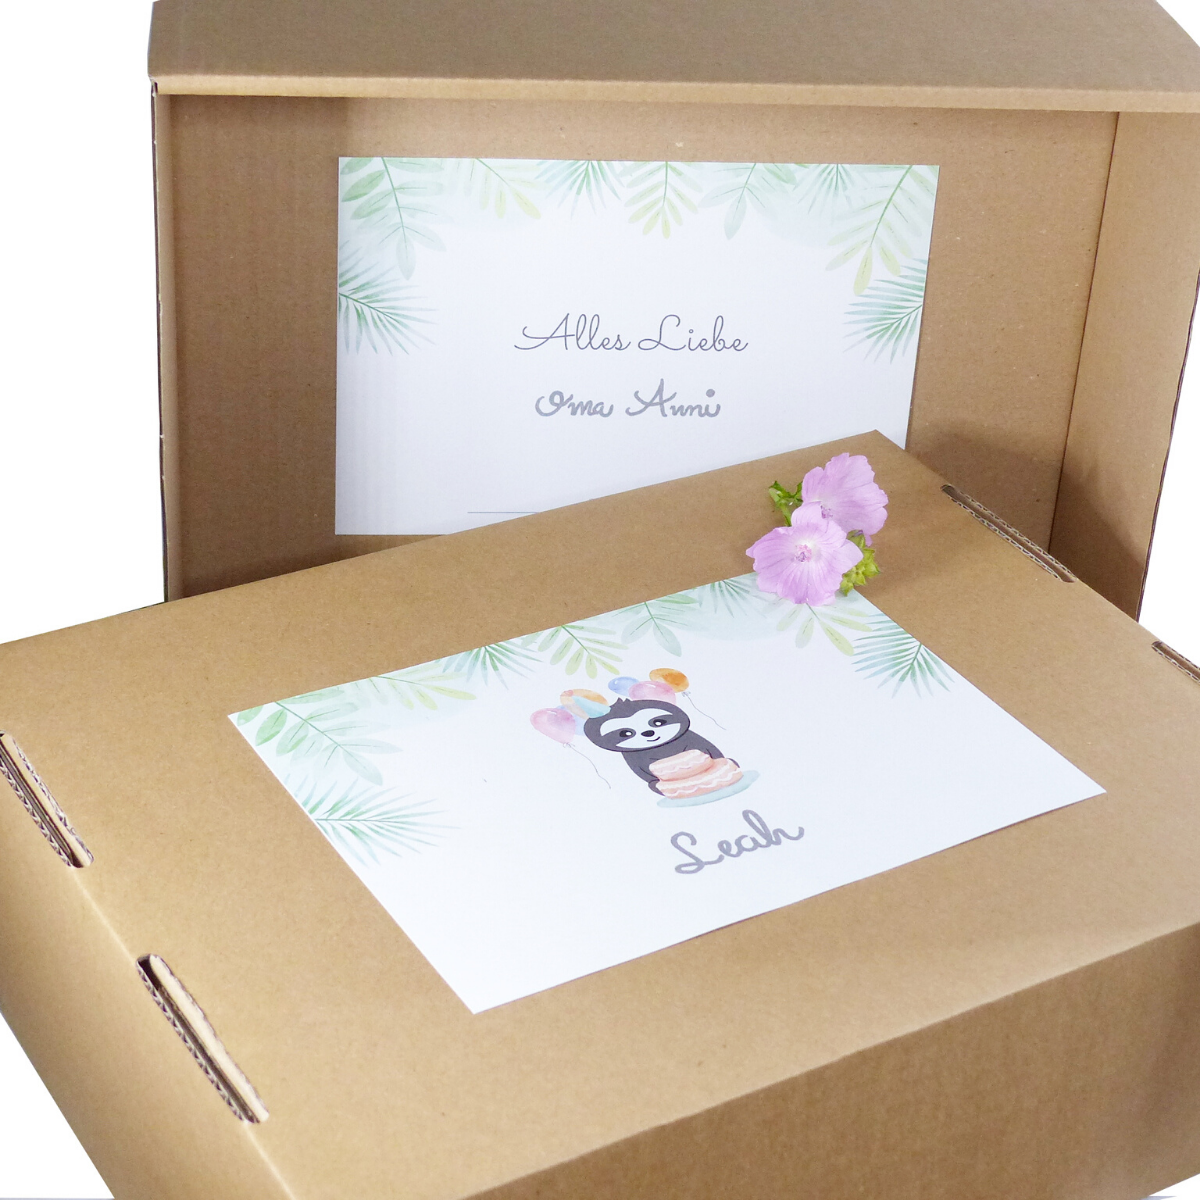 Chill n Feel - Babygeschenke verpacken_Geschenkbox_Geschenkpapier (5)